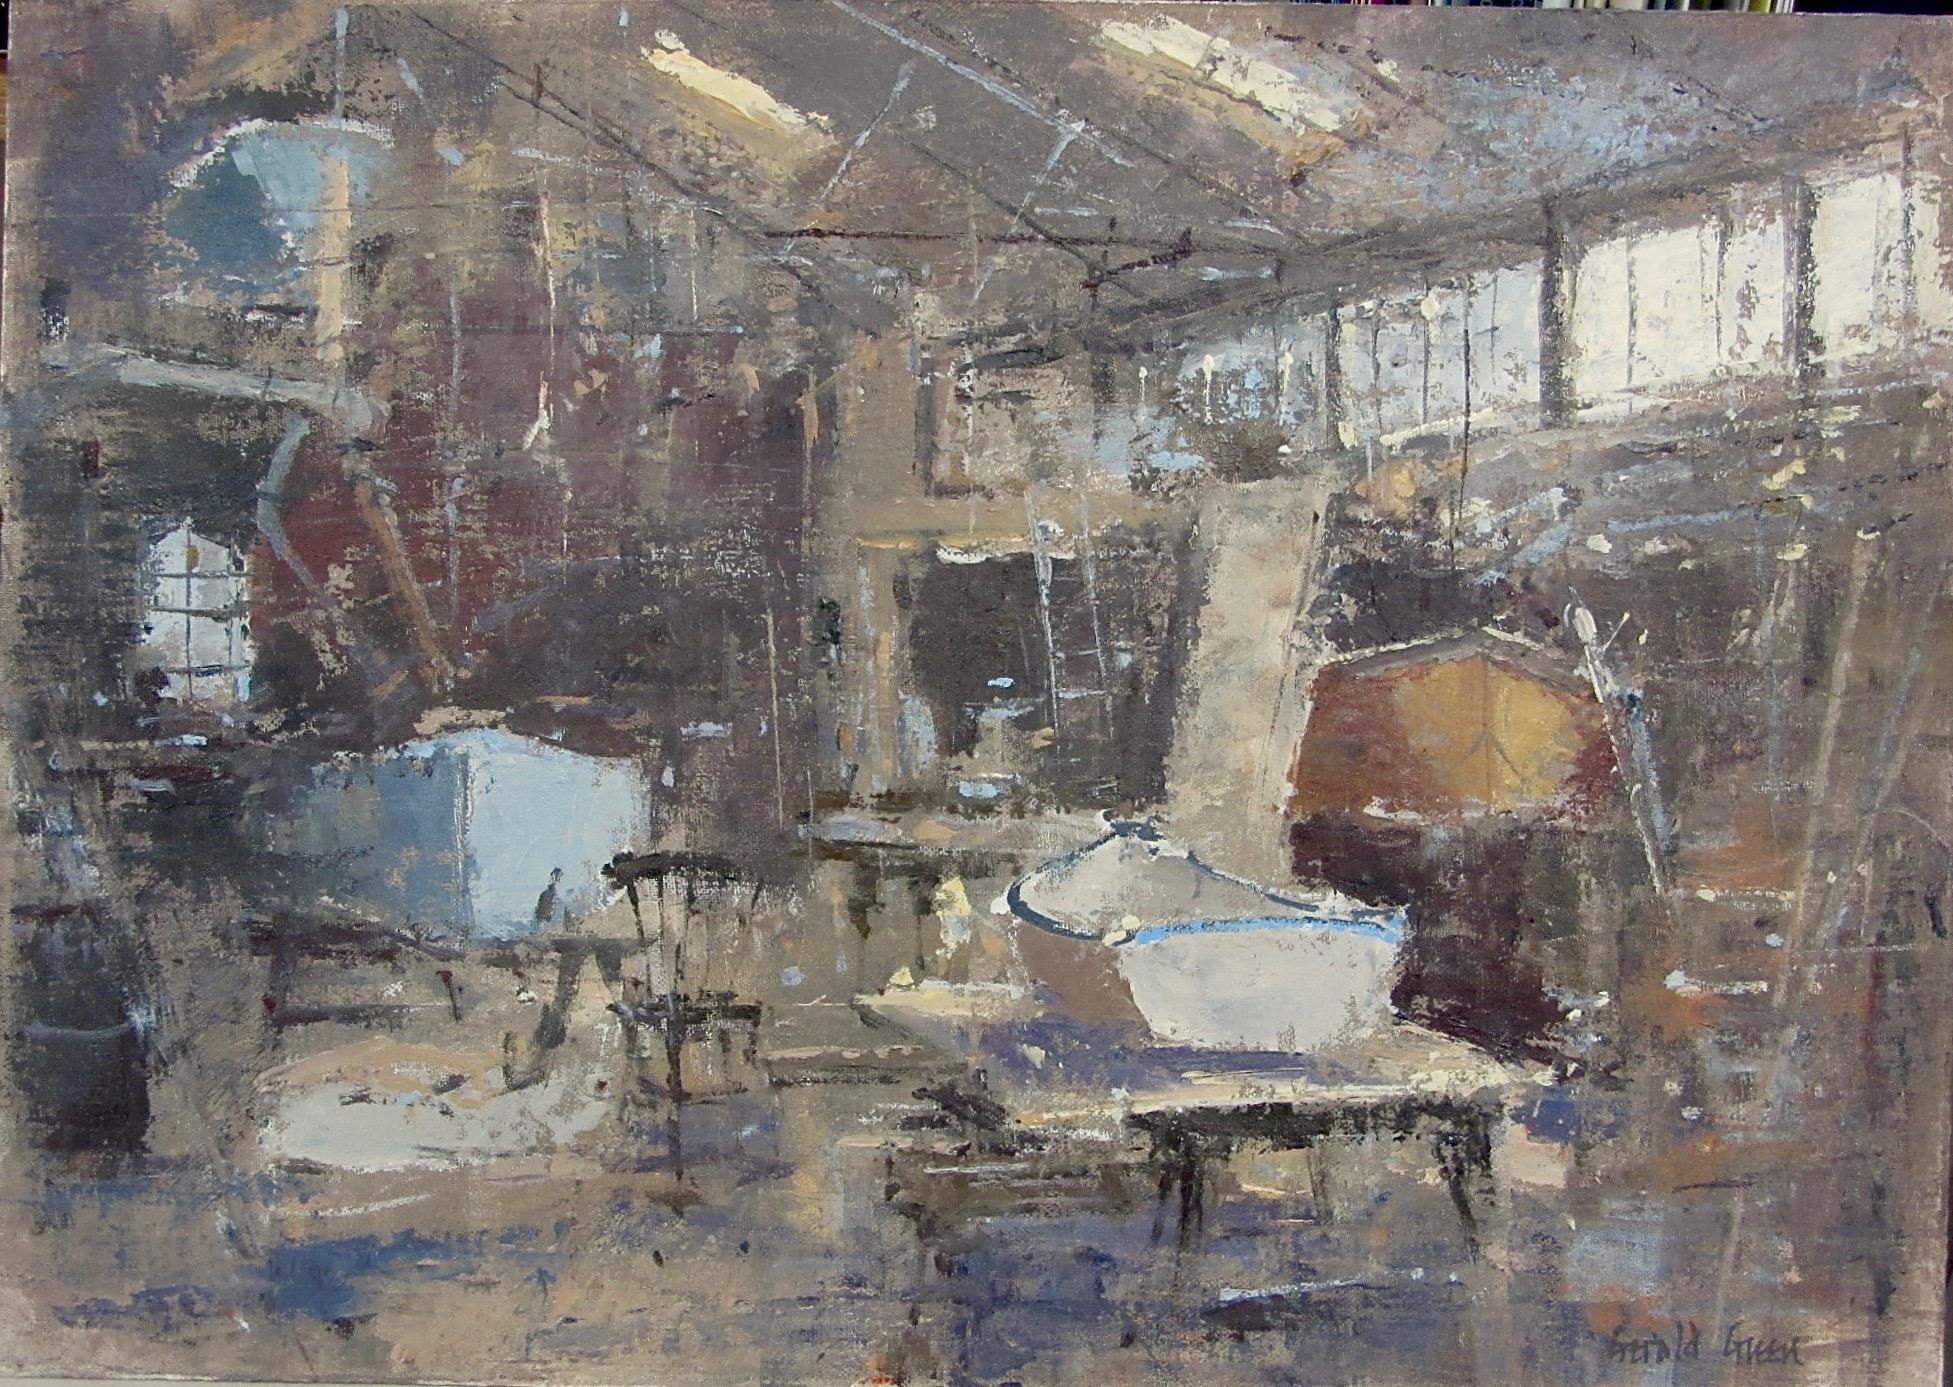 IN THE BOAT SHED FELIXSTOWE FERRY: 12 x 16 in: oil